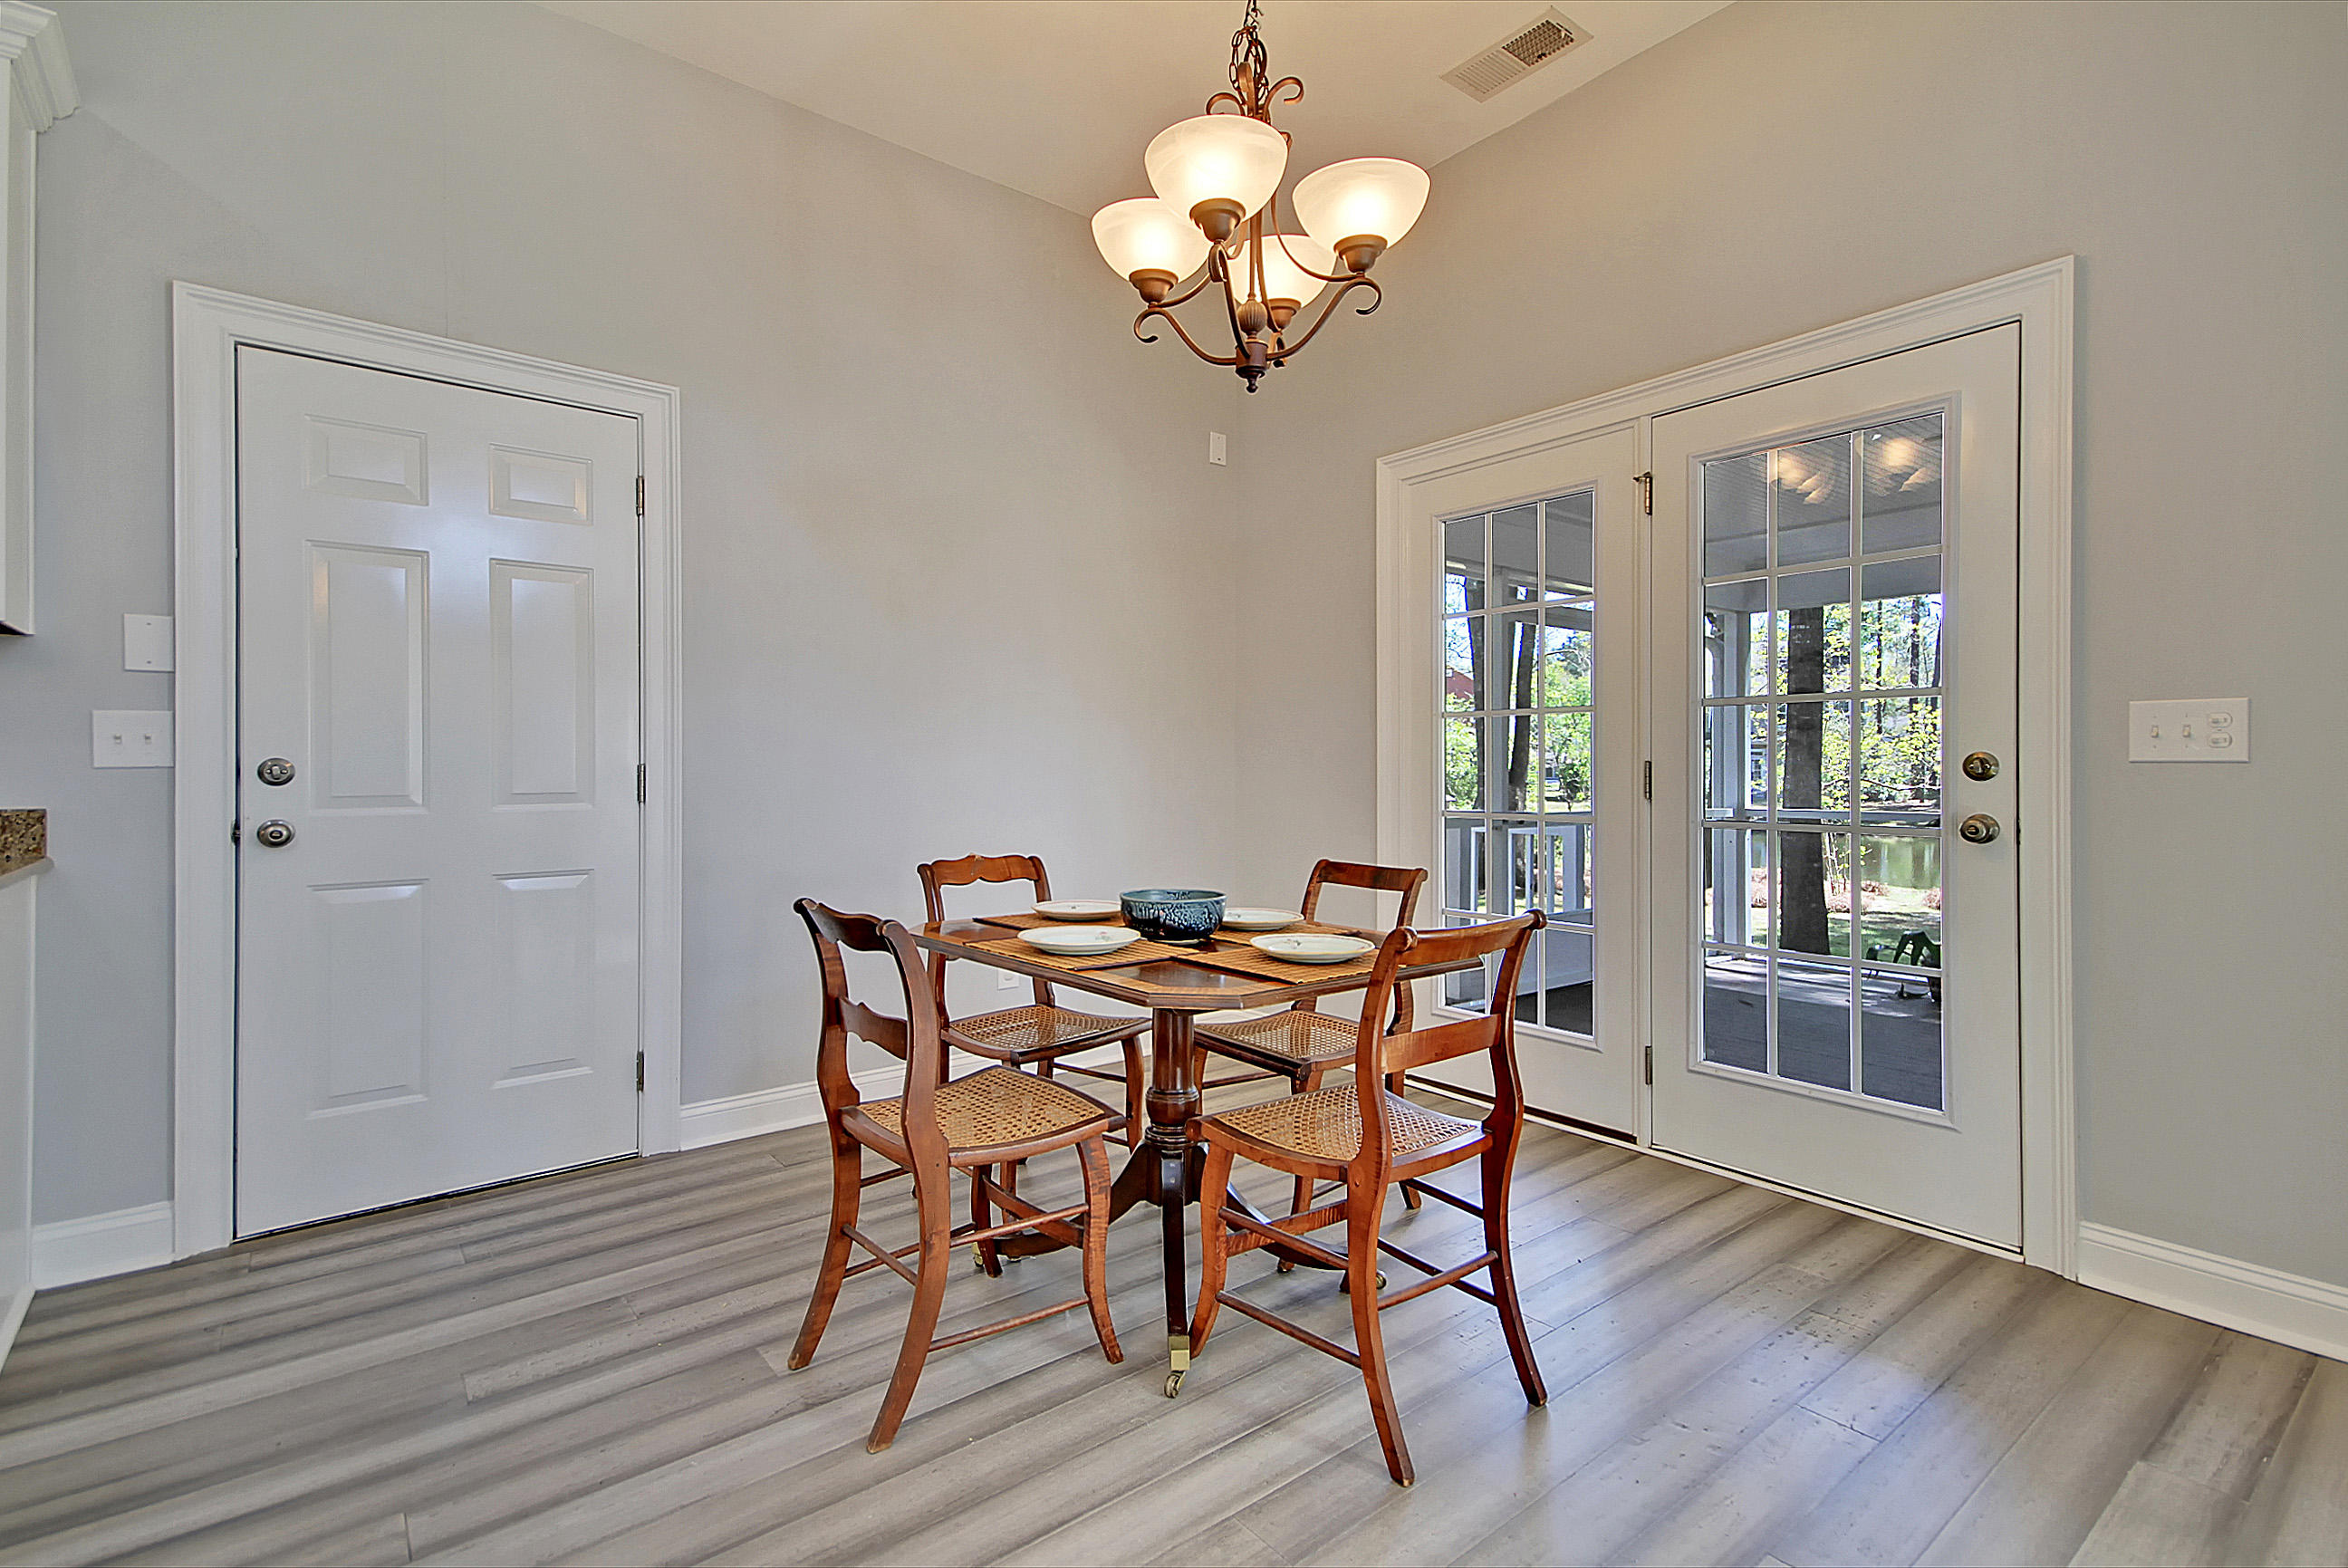 Park West Homes For Sale - 1883 Hall Point, Mount Pleasant, SC - 36